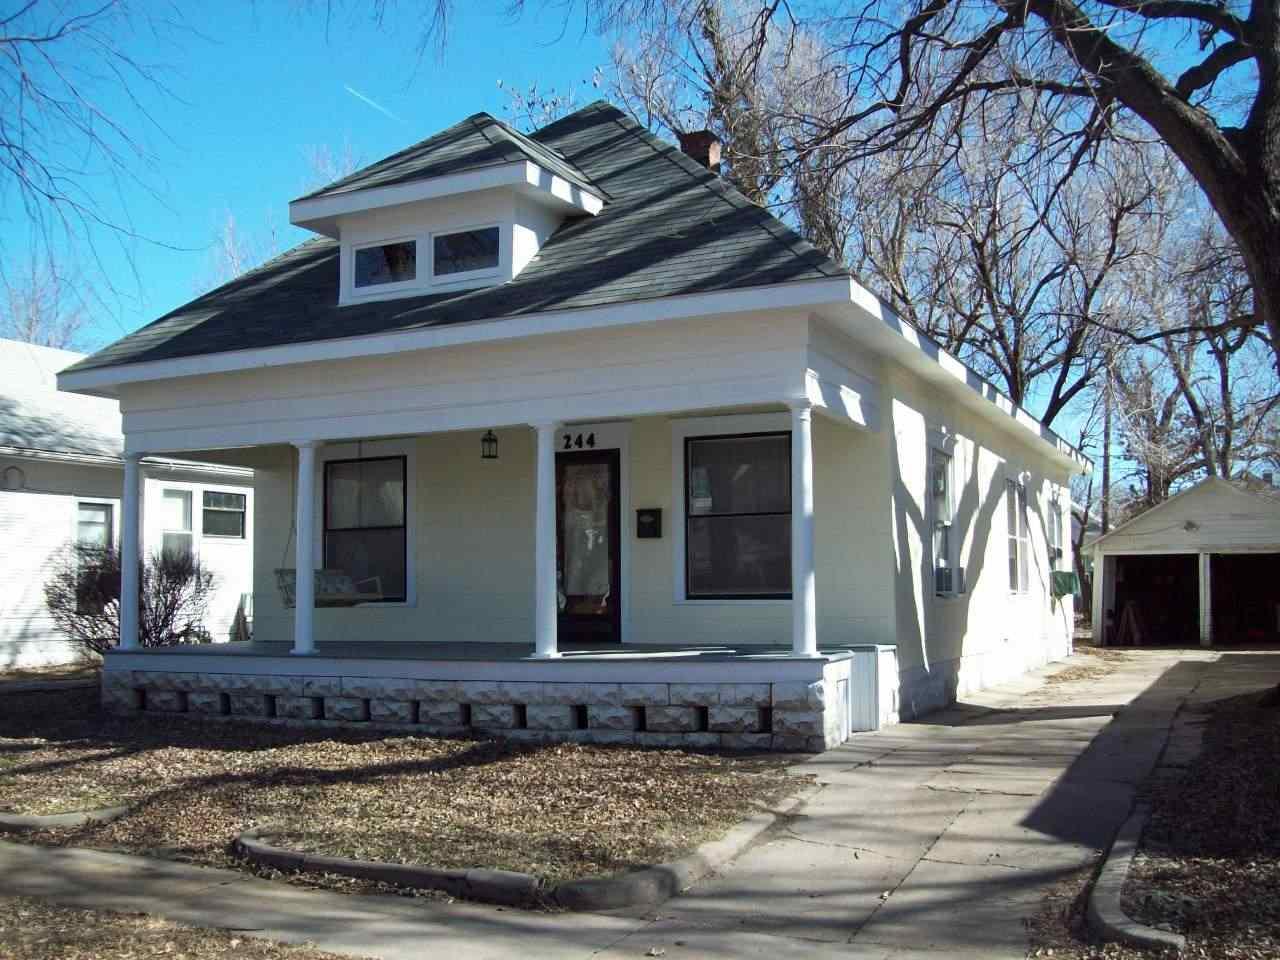 244 N Estelle St, Wichita, KS 67214